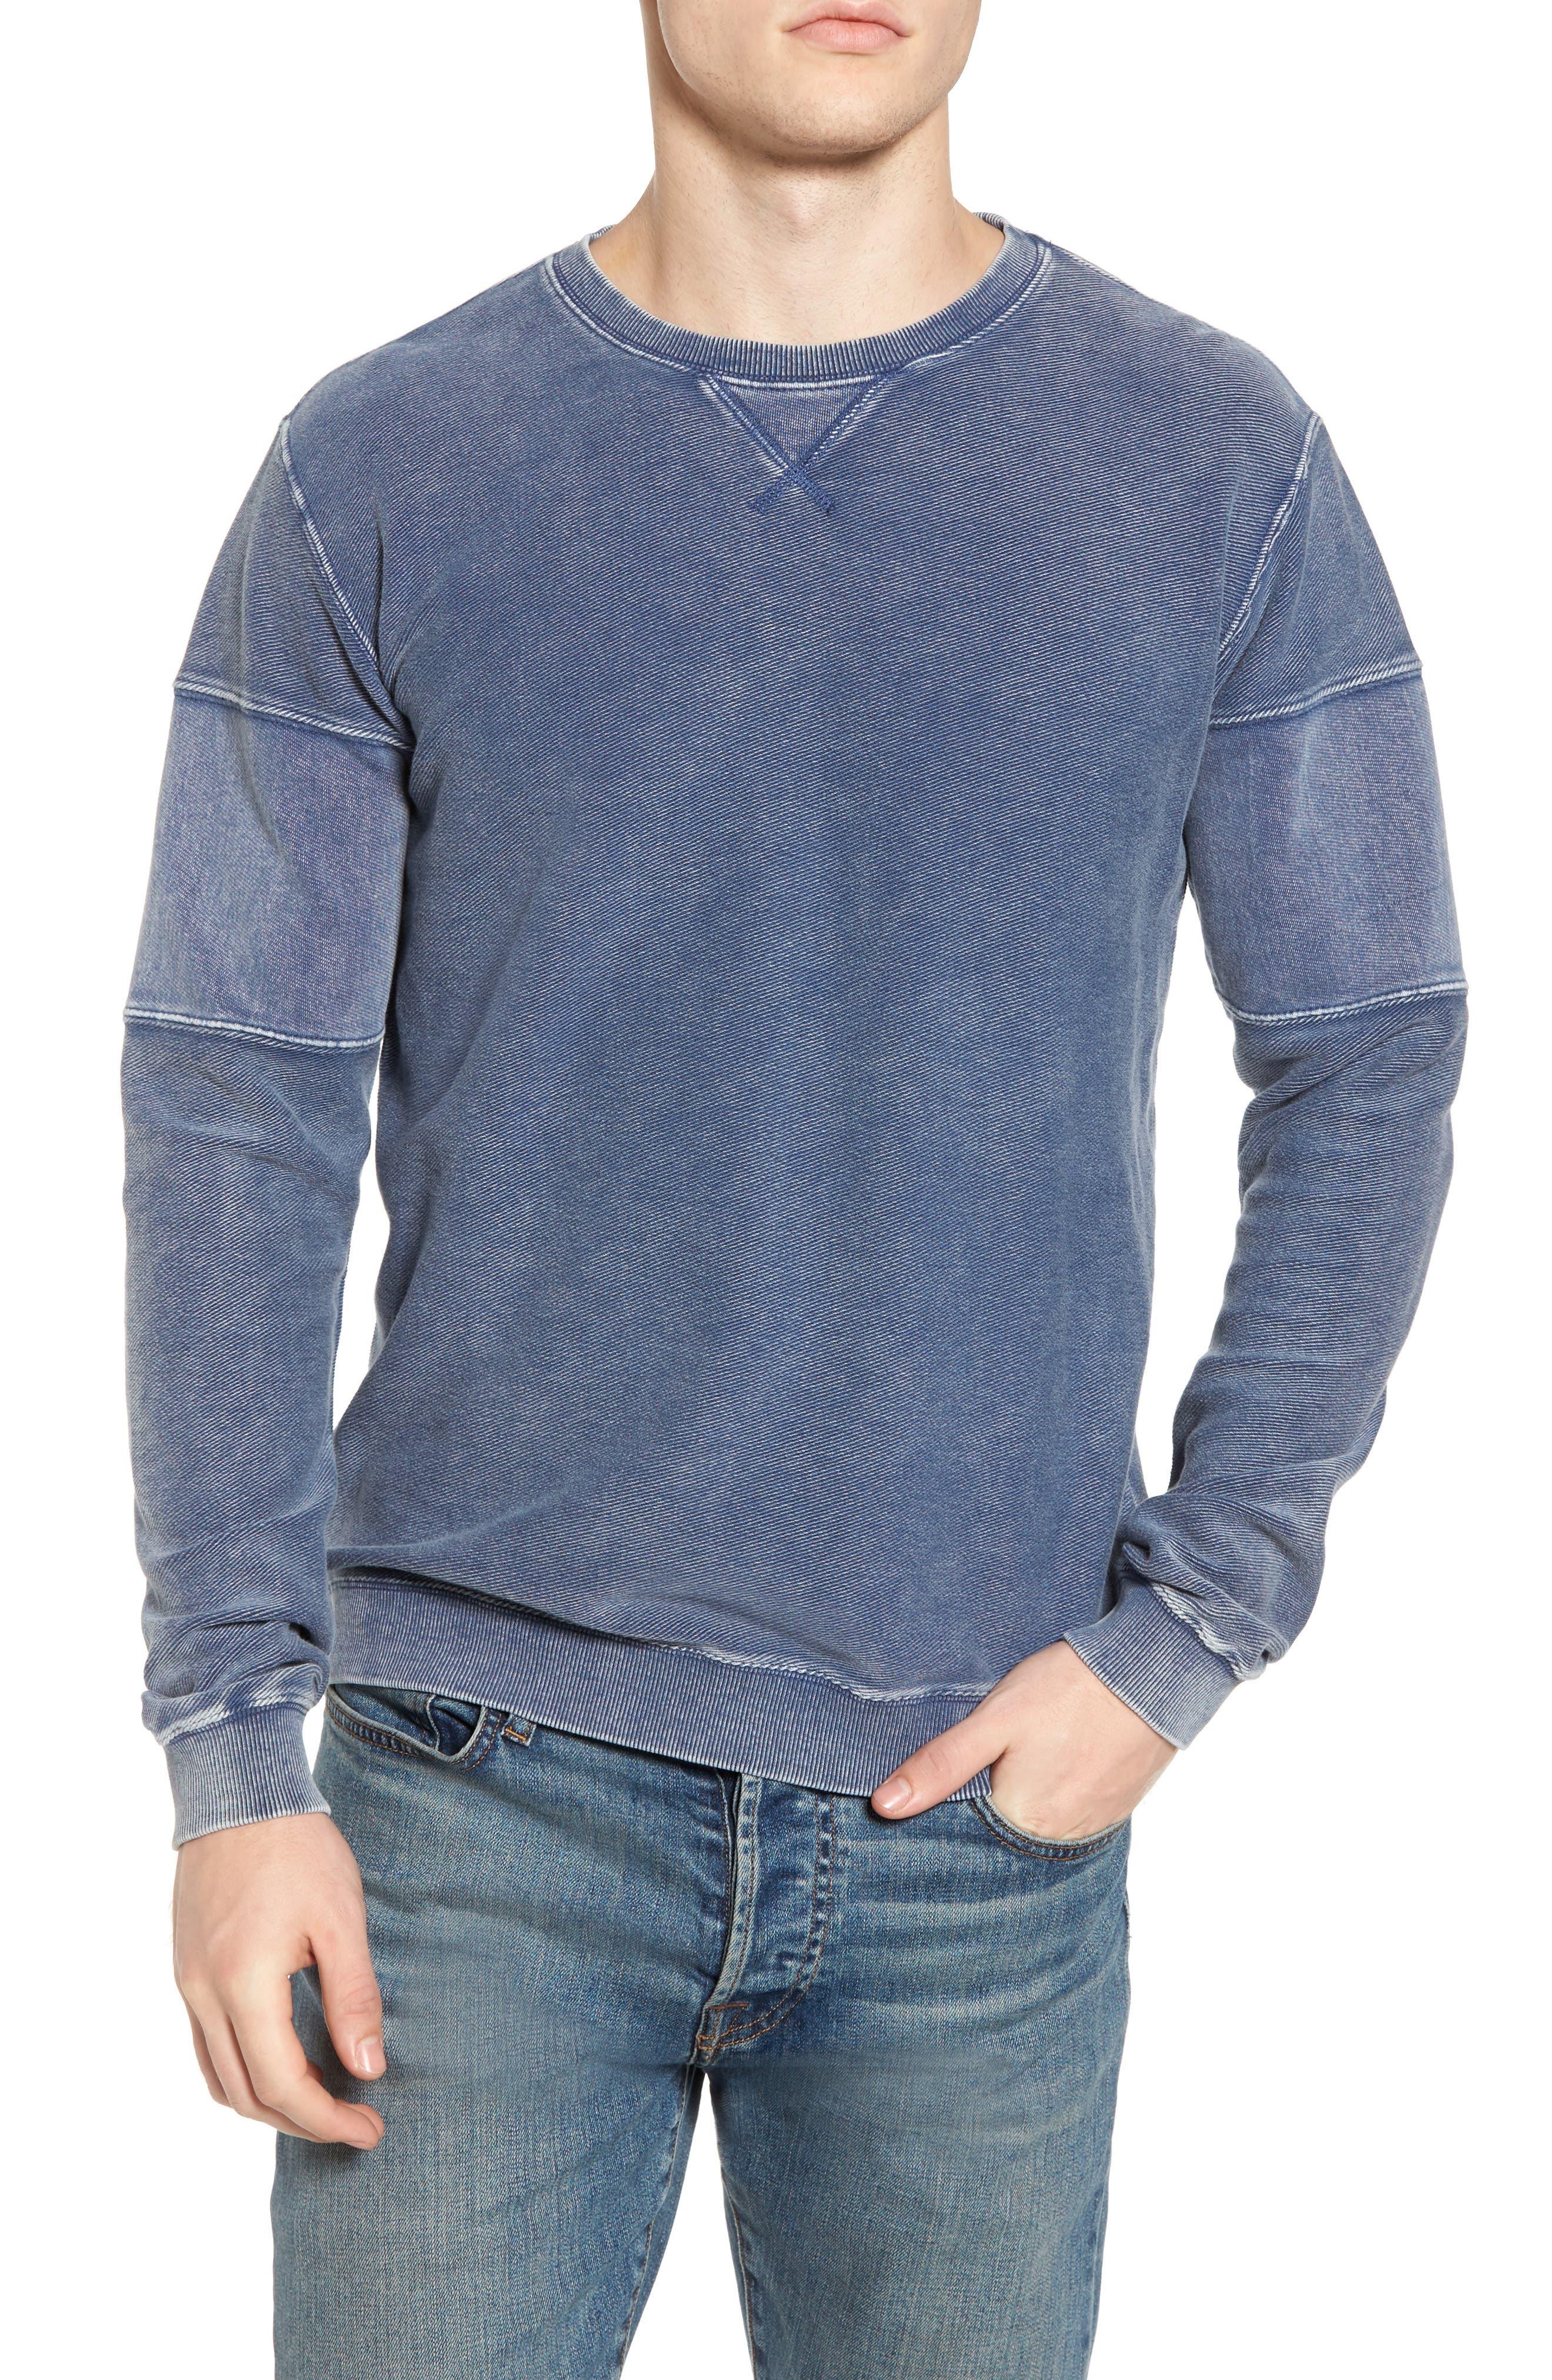 Main Image - RVCA Distressed Sweatshirt